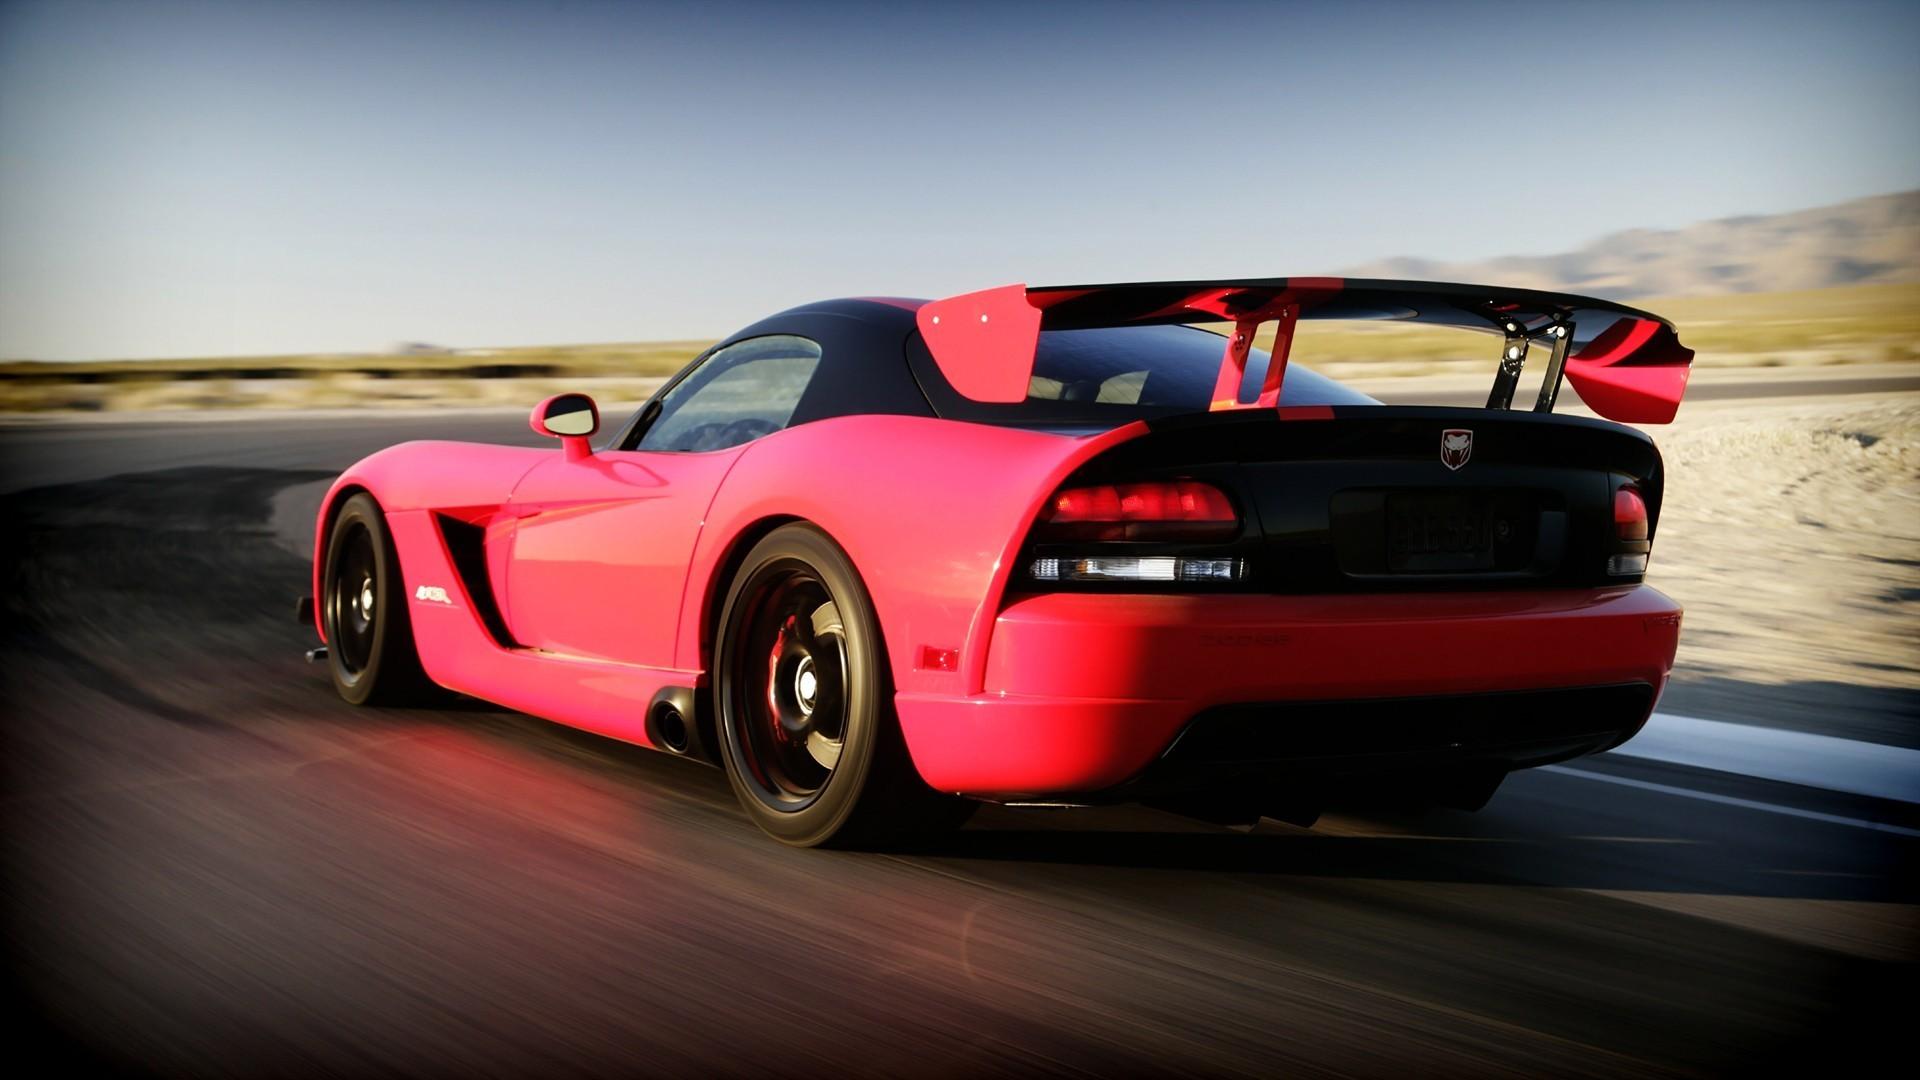 Viper Car Wallpaper Dodge Viper Vehicles Cars Exotic Tuning Wings Color Wheels